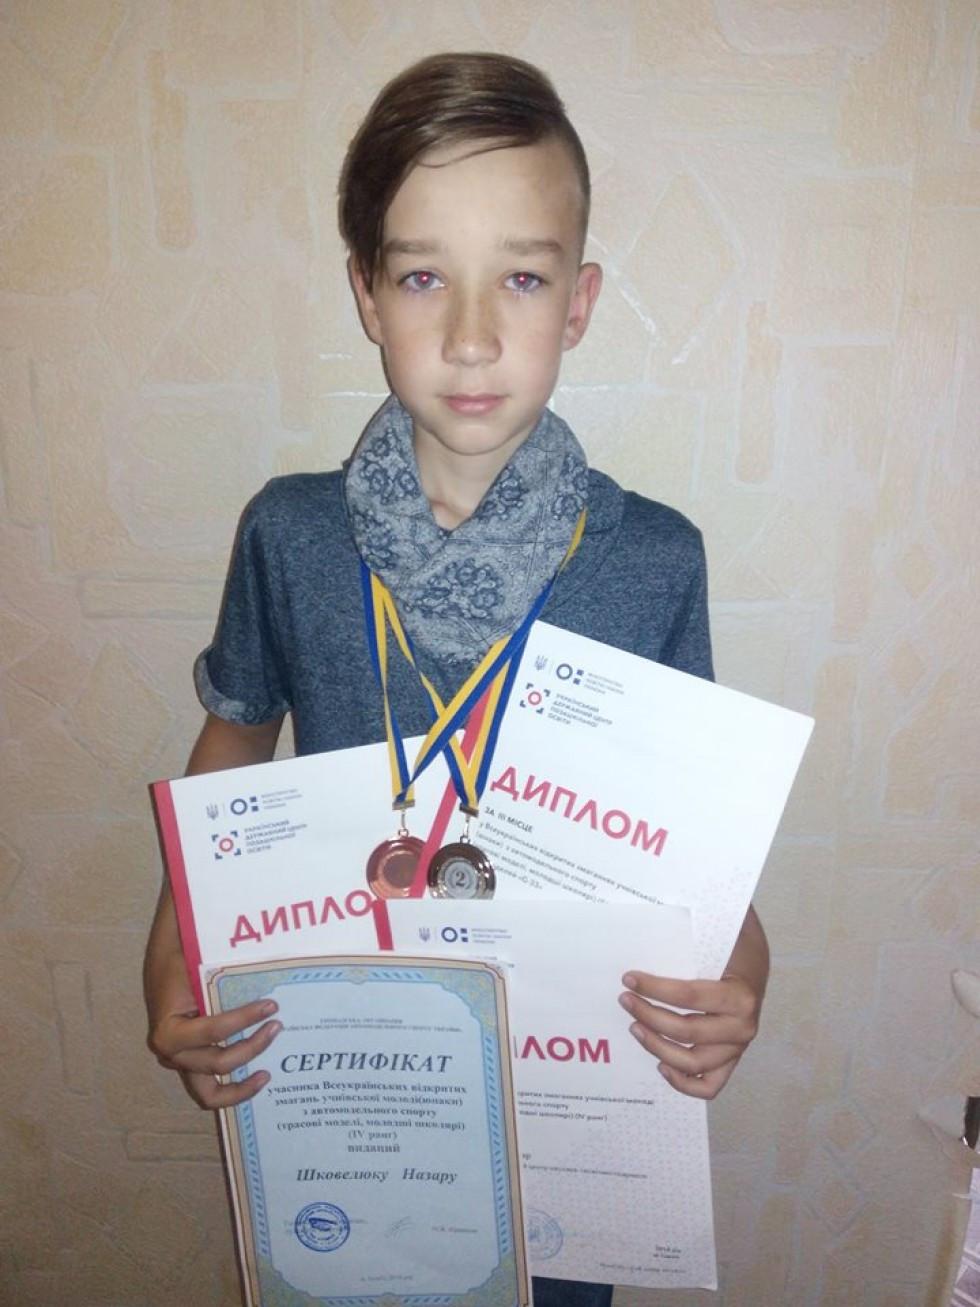 Хлопчик з грамотами й медалями